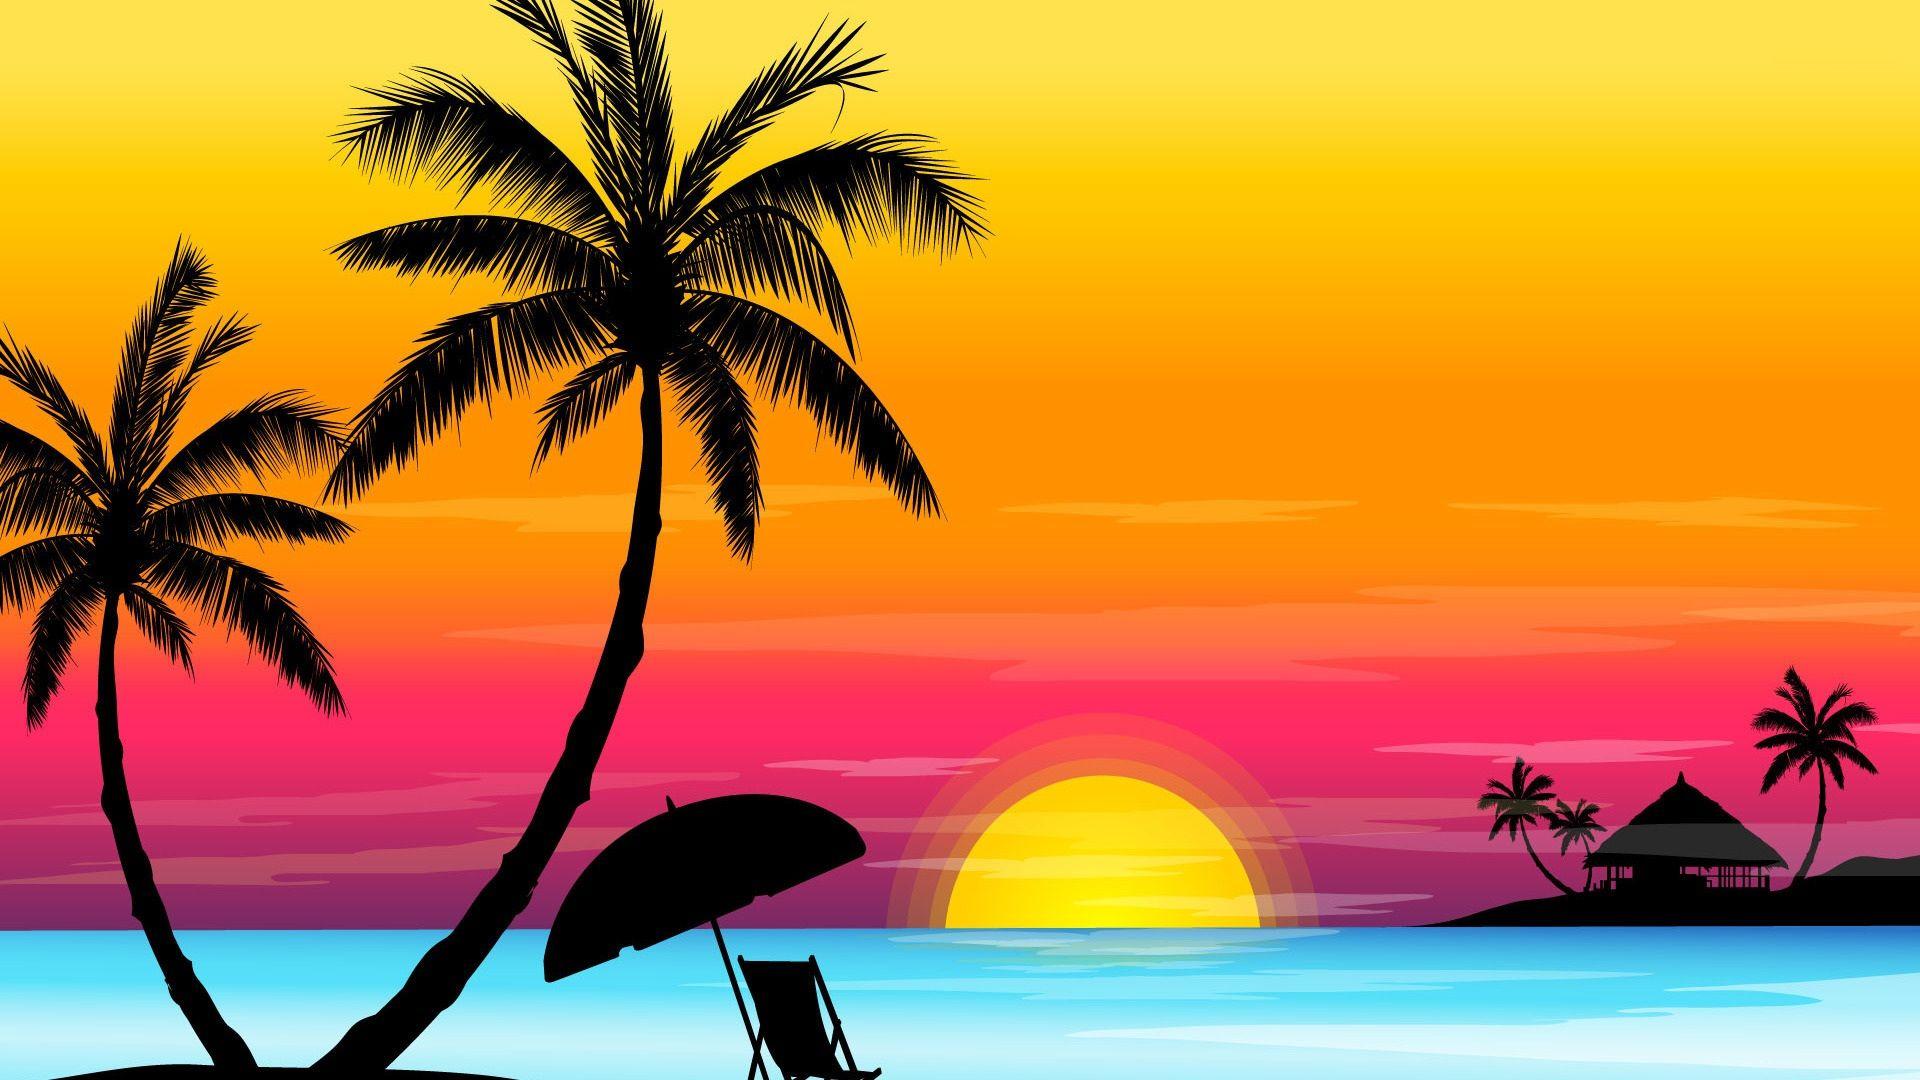 Beach Sunset 1080p Wallpaper Unique Hd Wallpapers Beach Sunset Wallpaper Beach Background Sunset Wallpaper